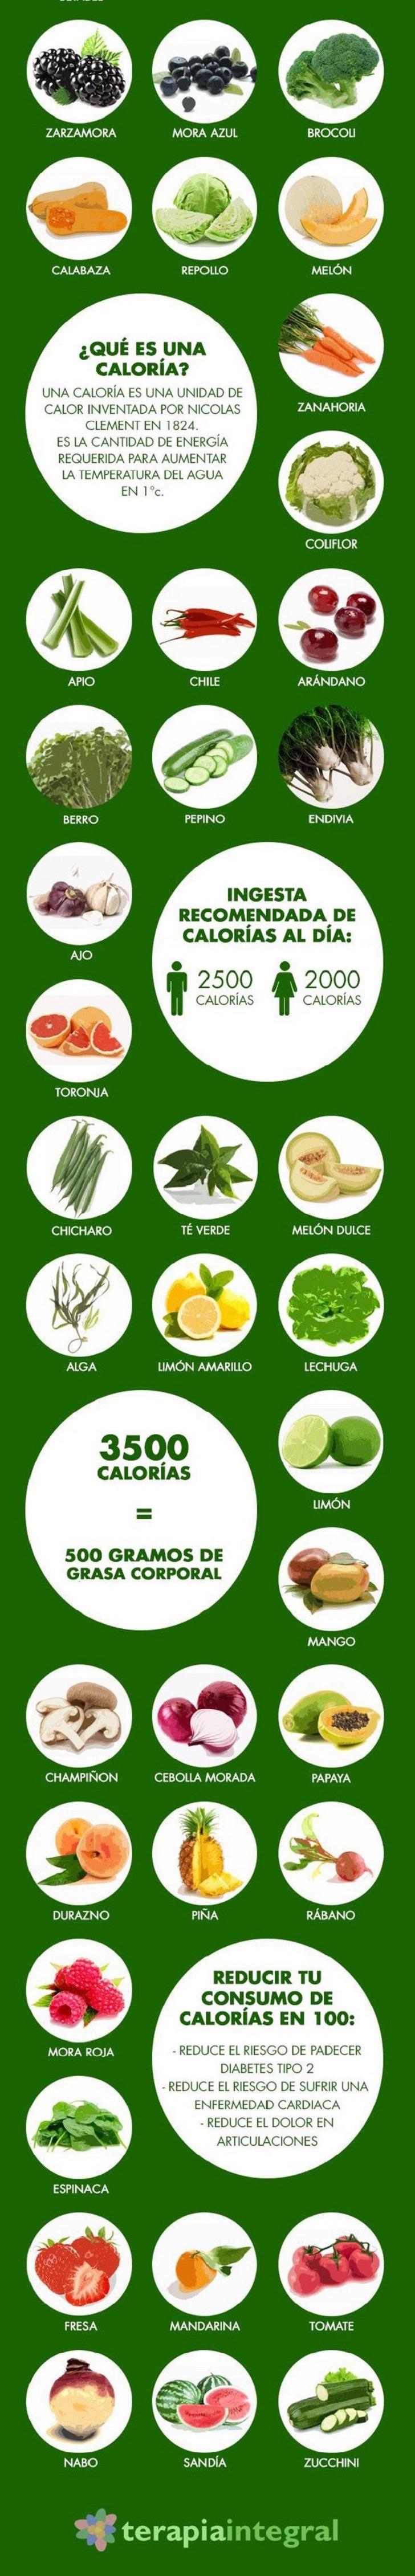 alimentos bajos en calorías